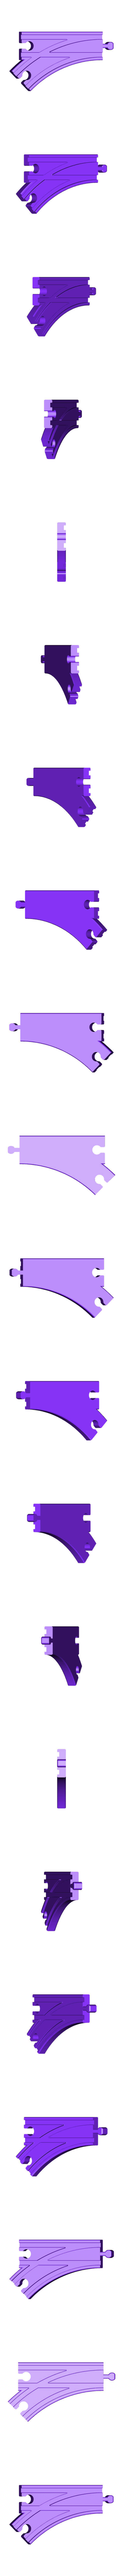 Right Join Track.stl Download free STL file Toy Train Tracks • 3D printer design, FerryTeacher